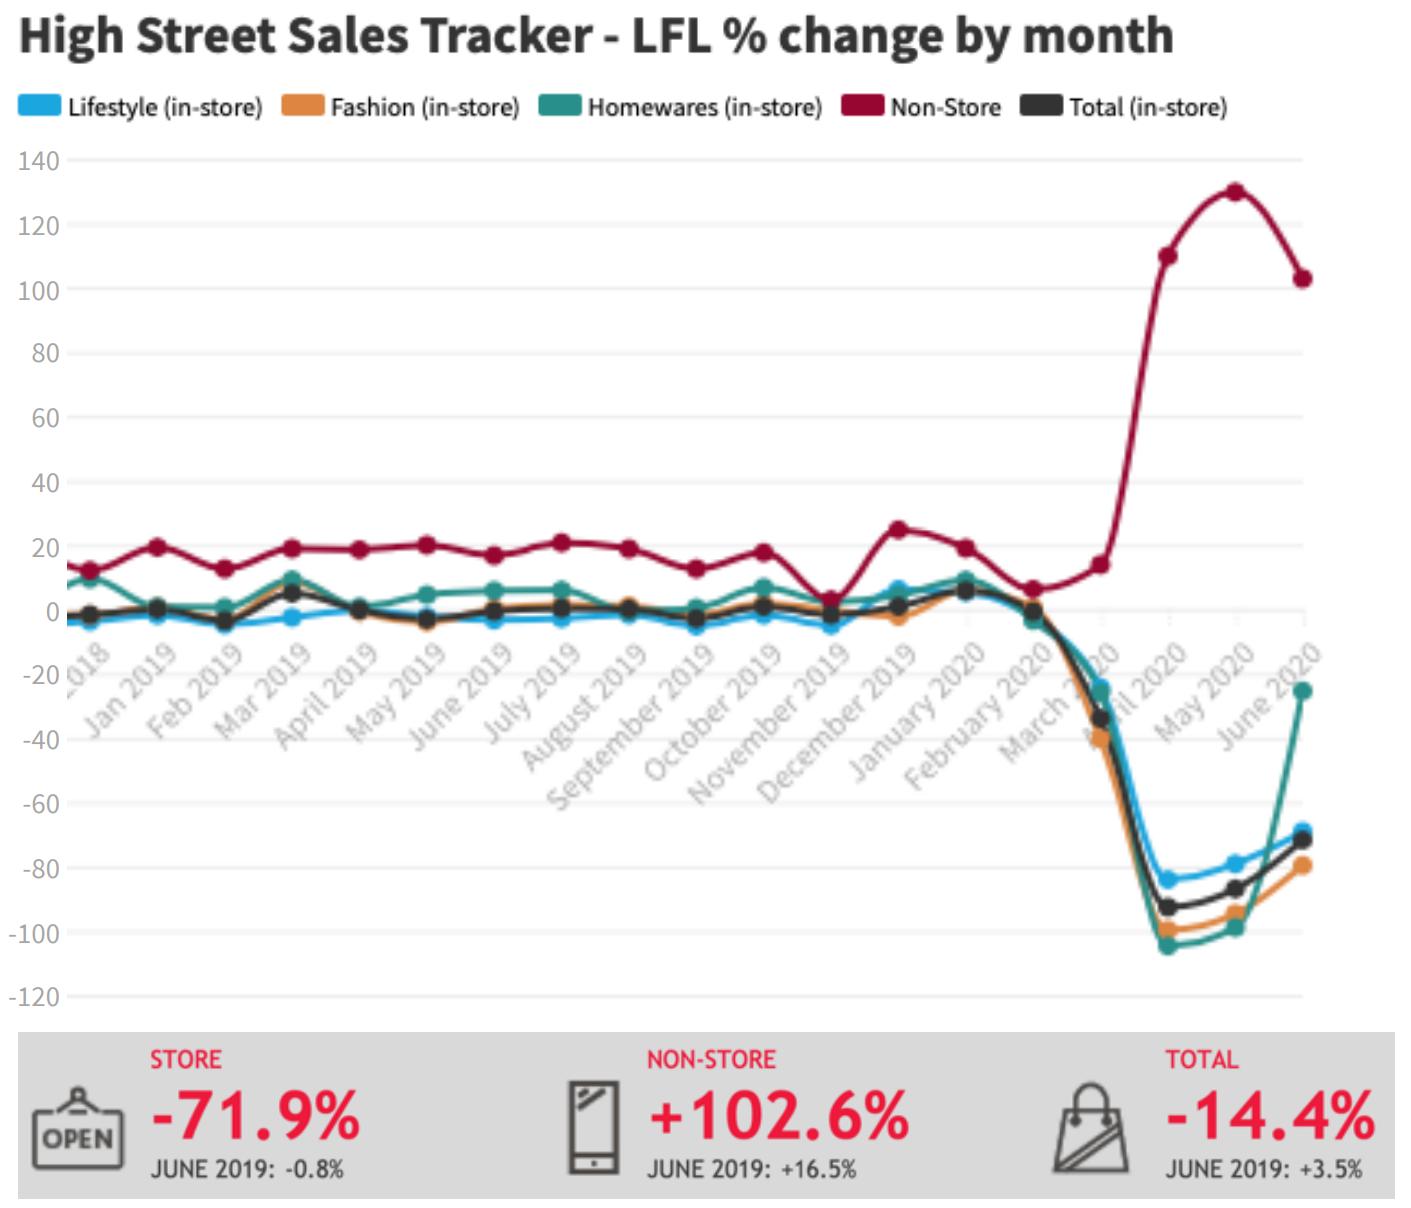 BDO High Street Sales tracker